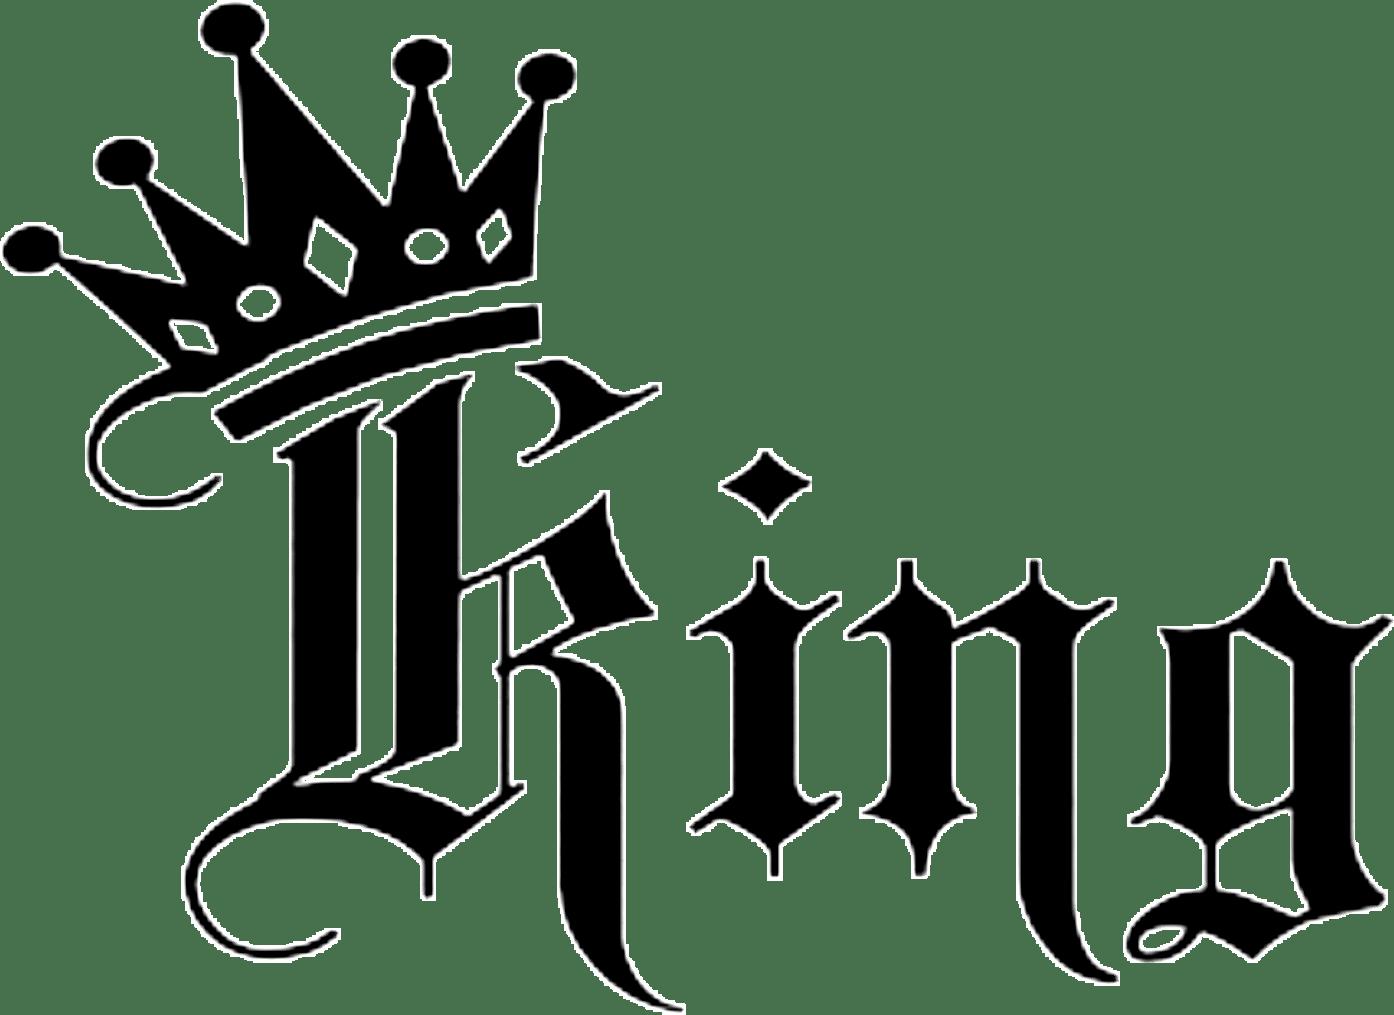 King Crown Black